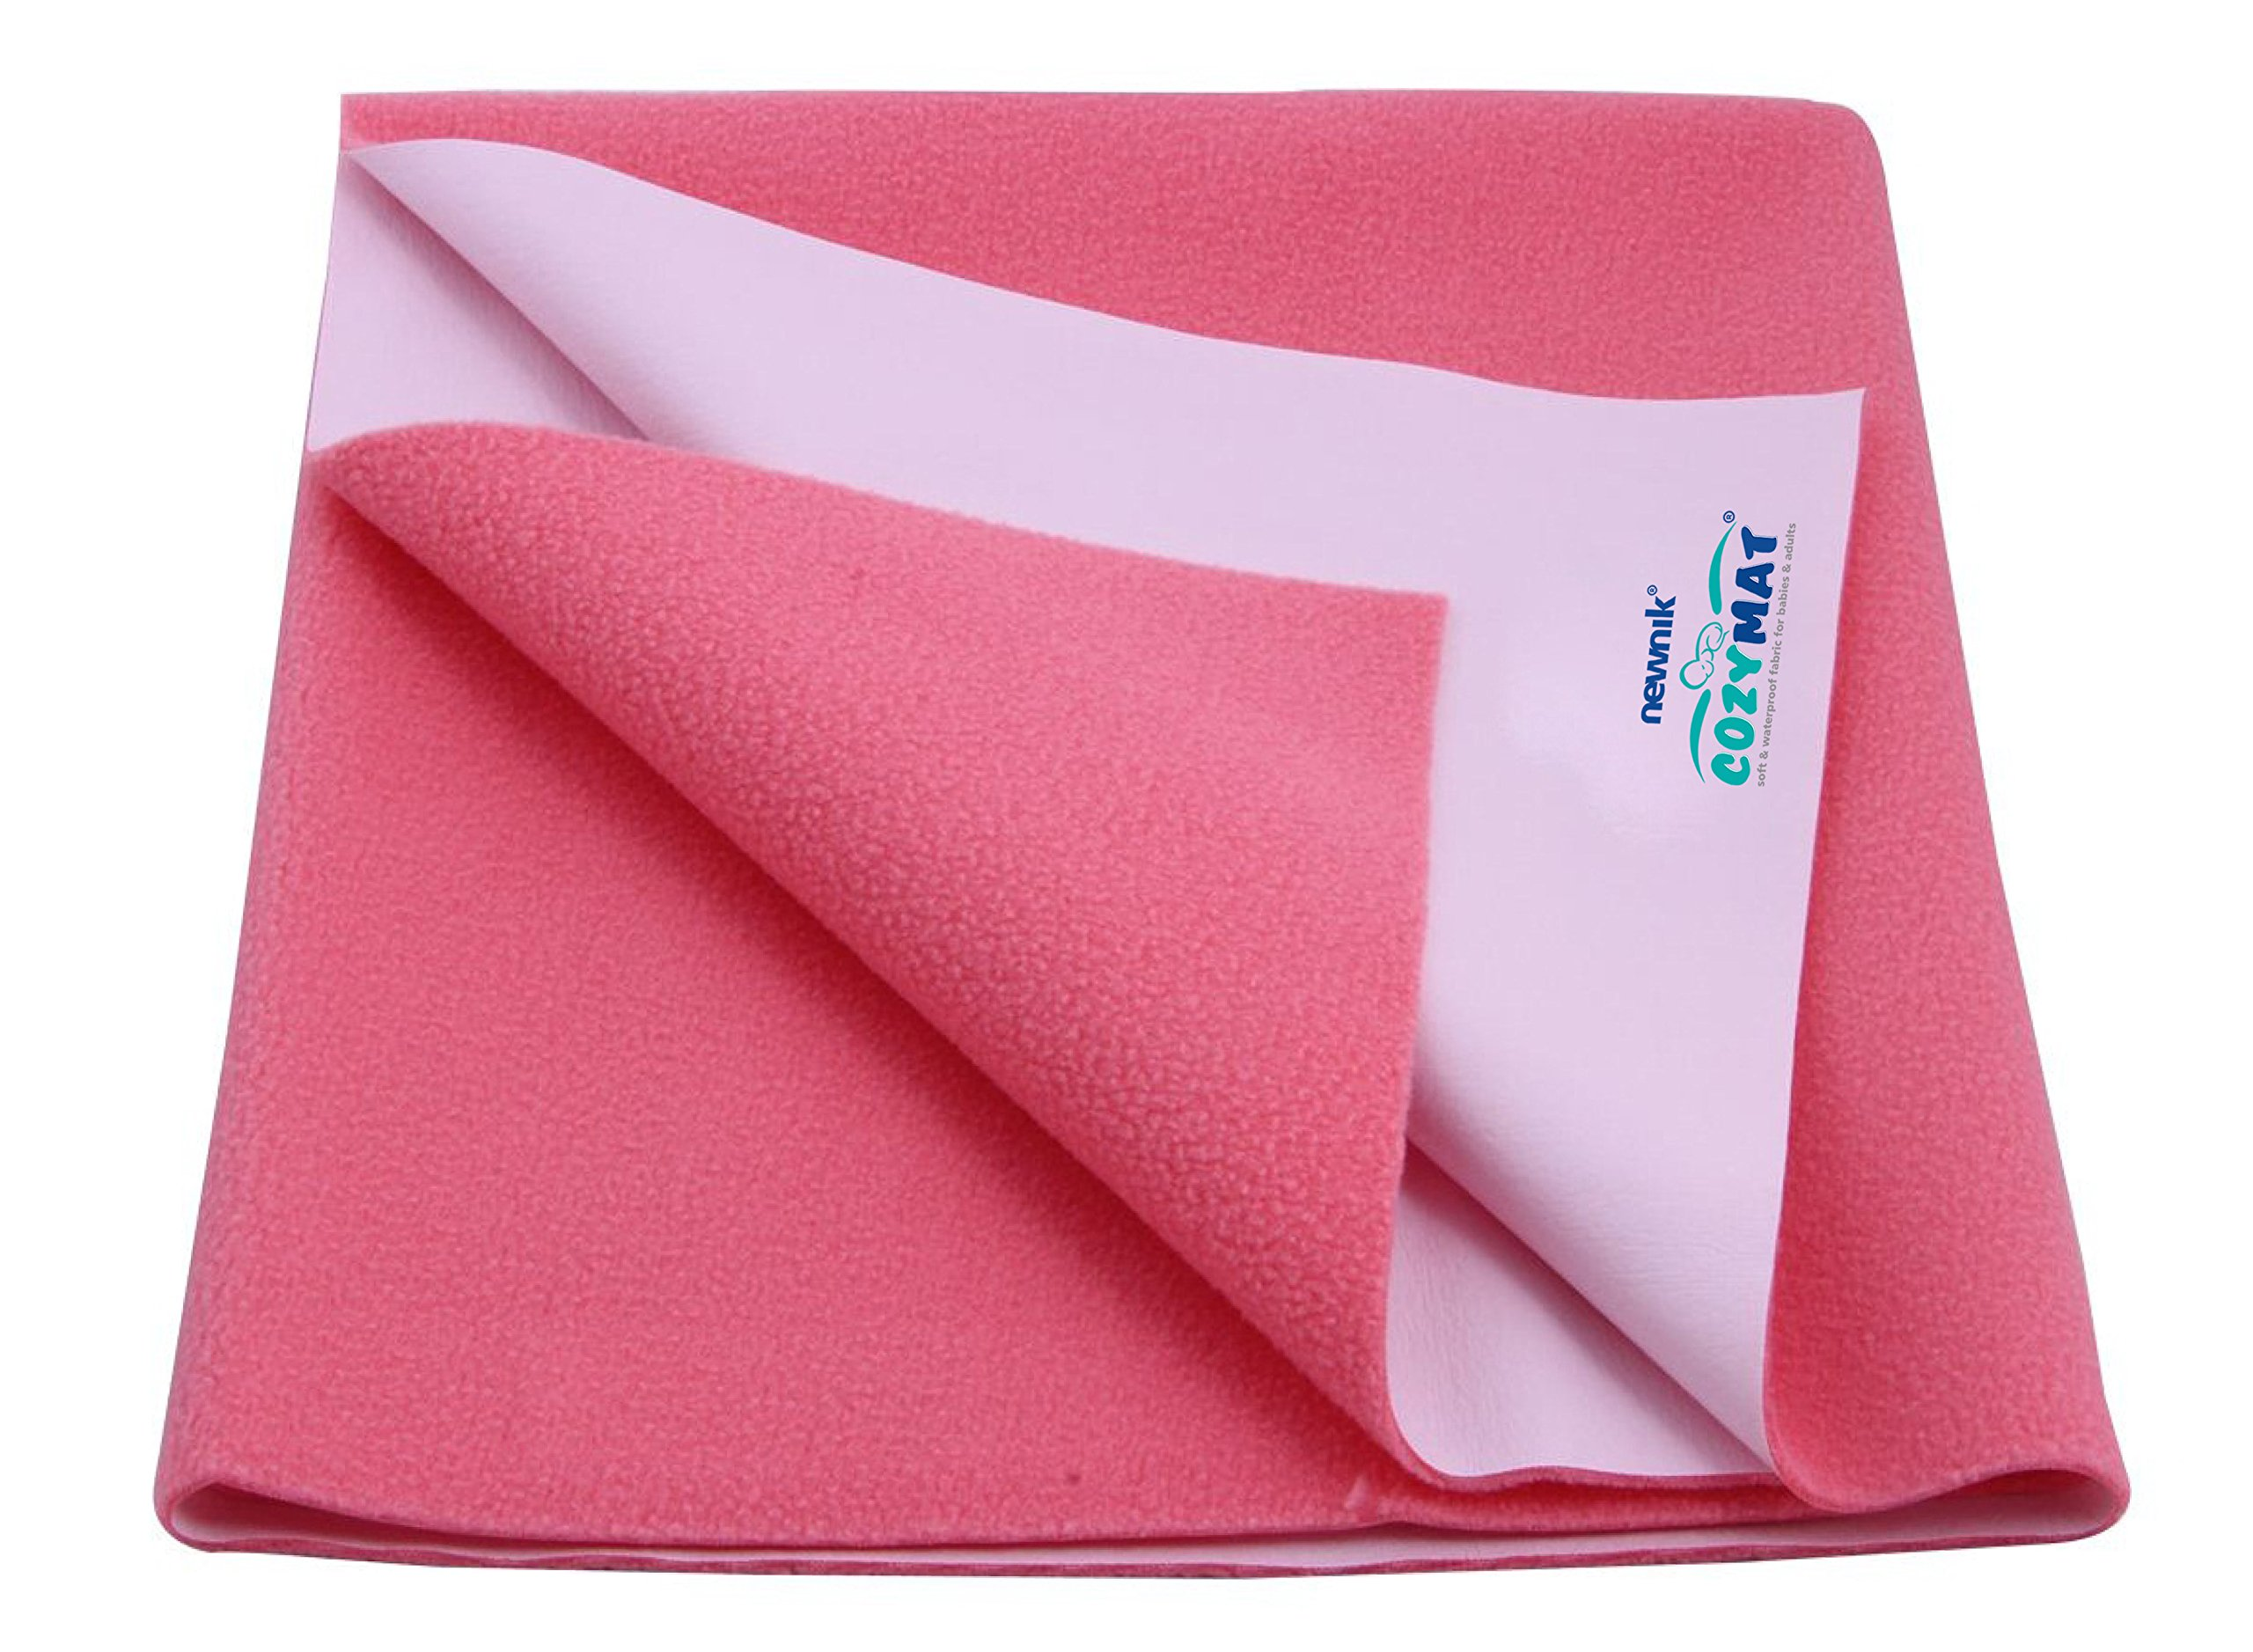 Cozymat Soft, Waterproof, Reusable Mat / Underpad / Absorbent Sheets / Mattress Protector (Size: 140cm x 100cm) SALMONROSE, L